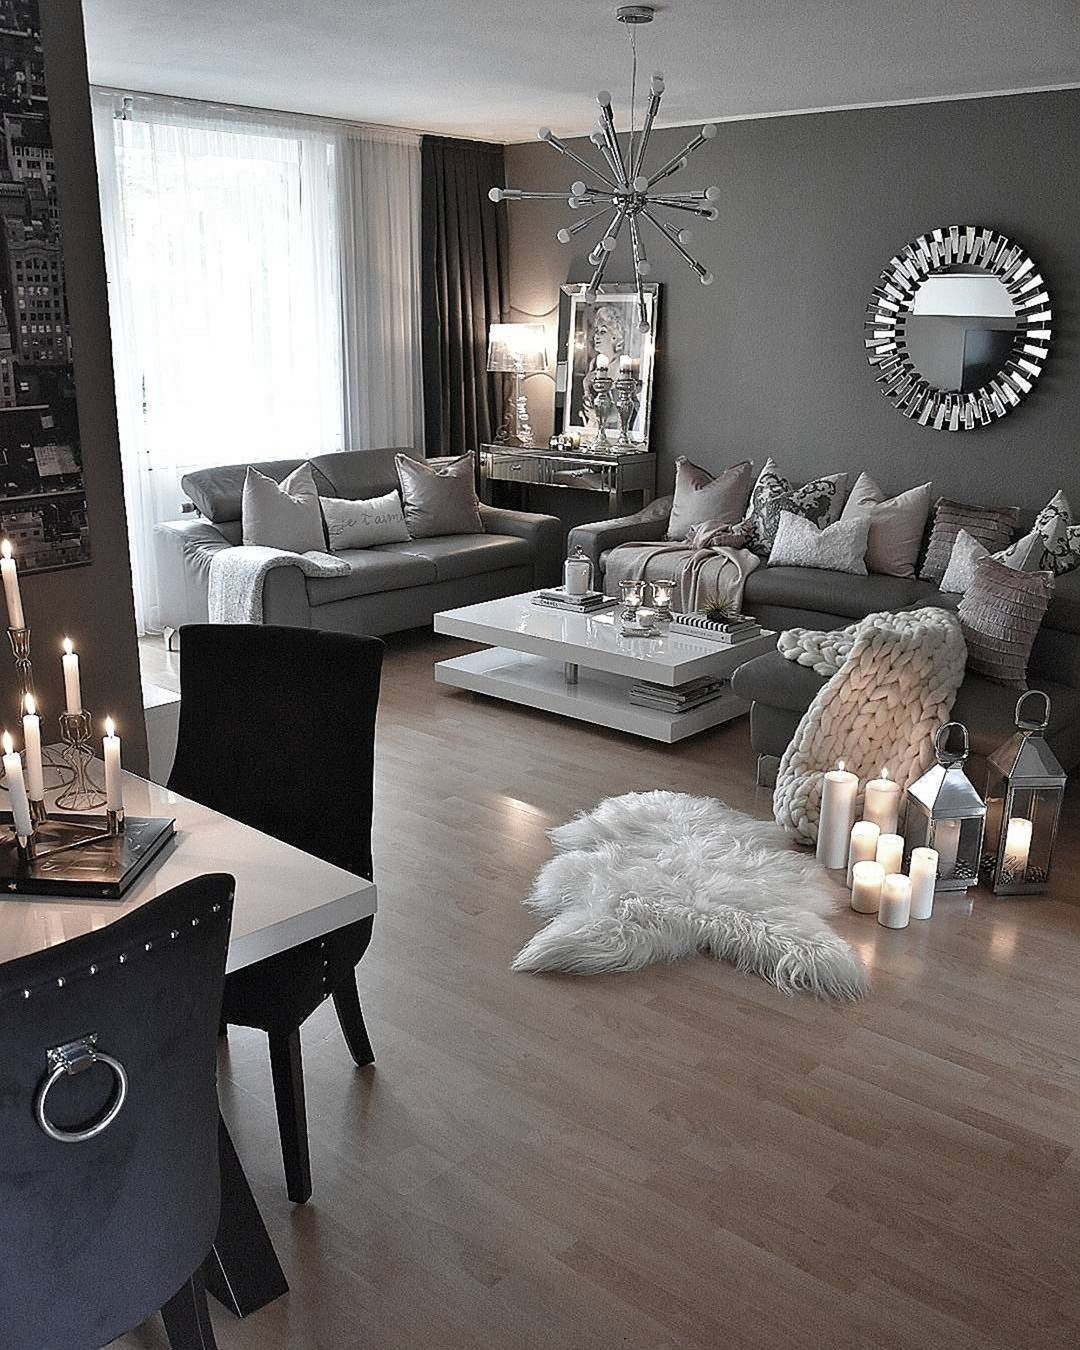 Best Black And White Interior Design 1 Best Black And White